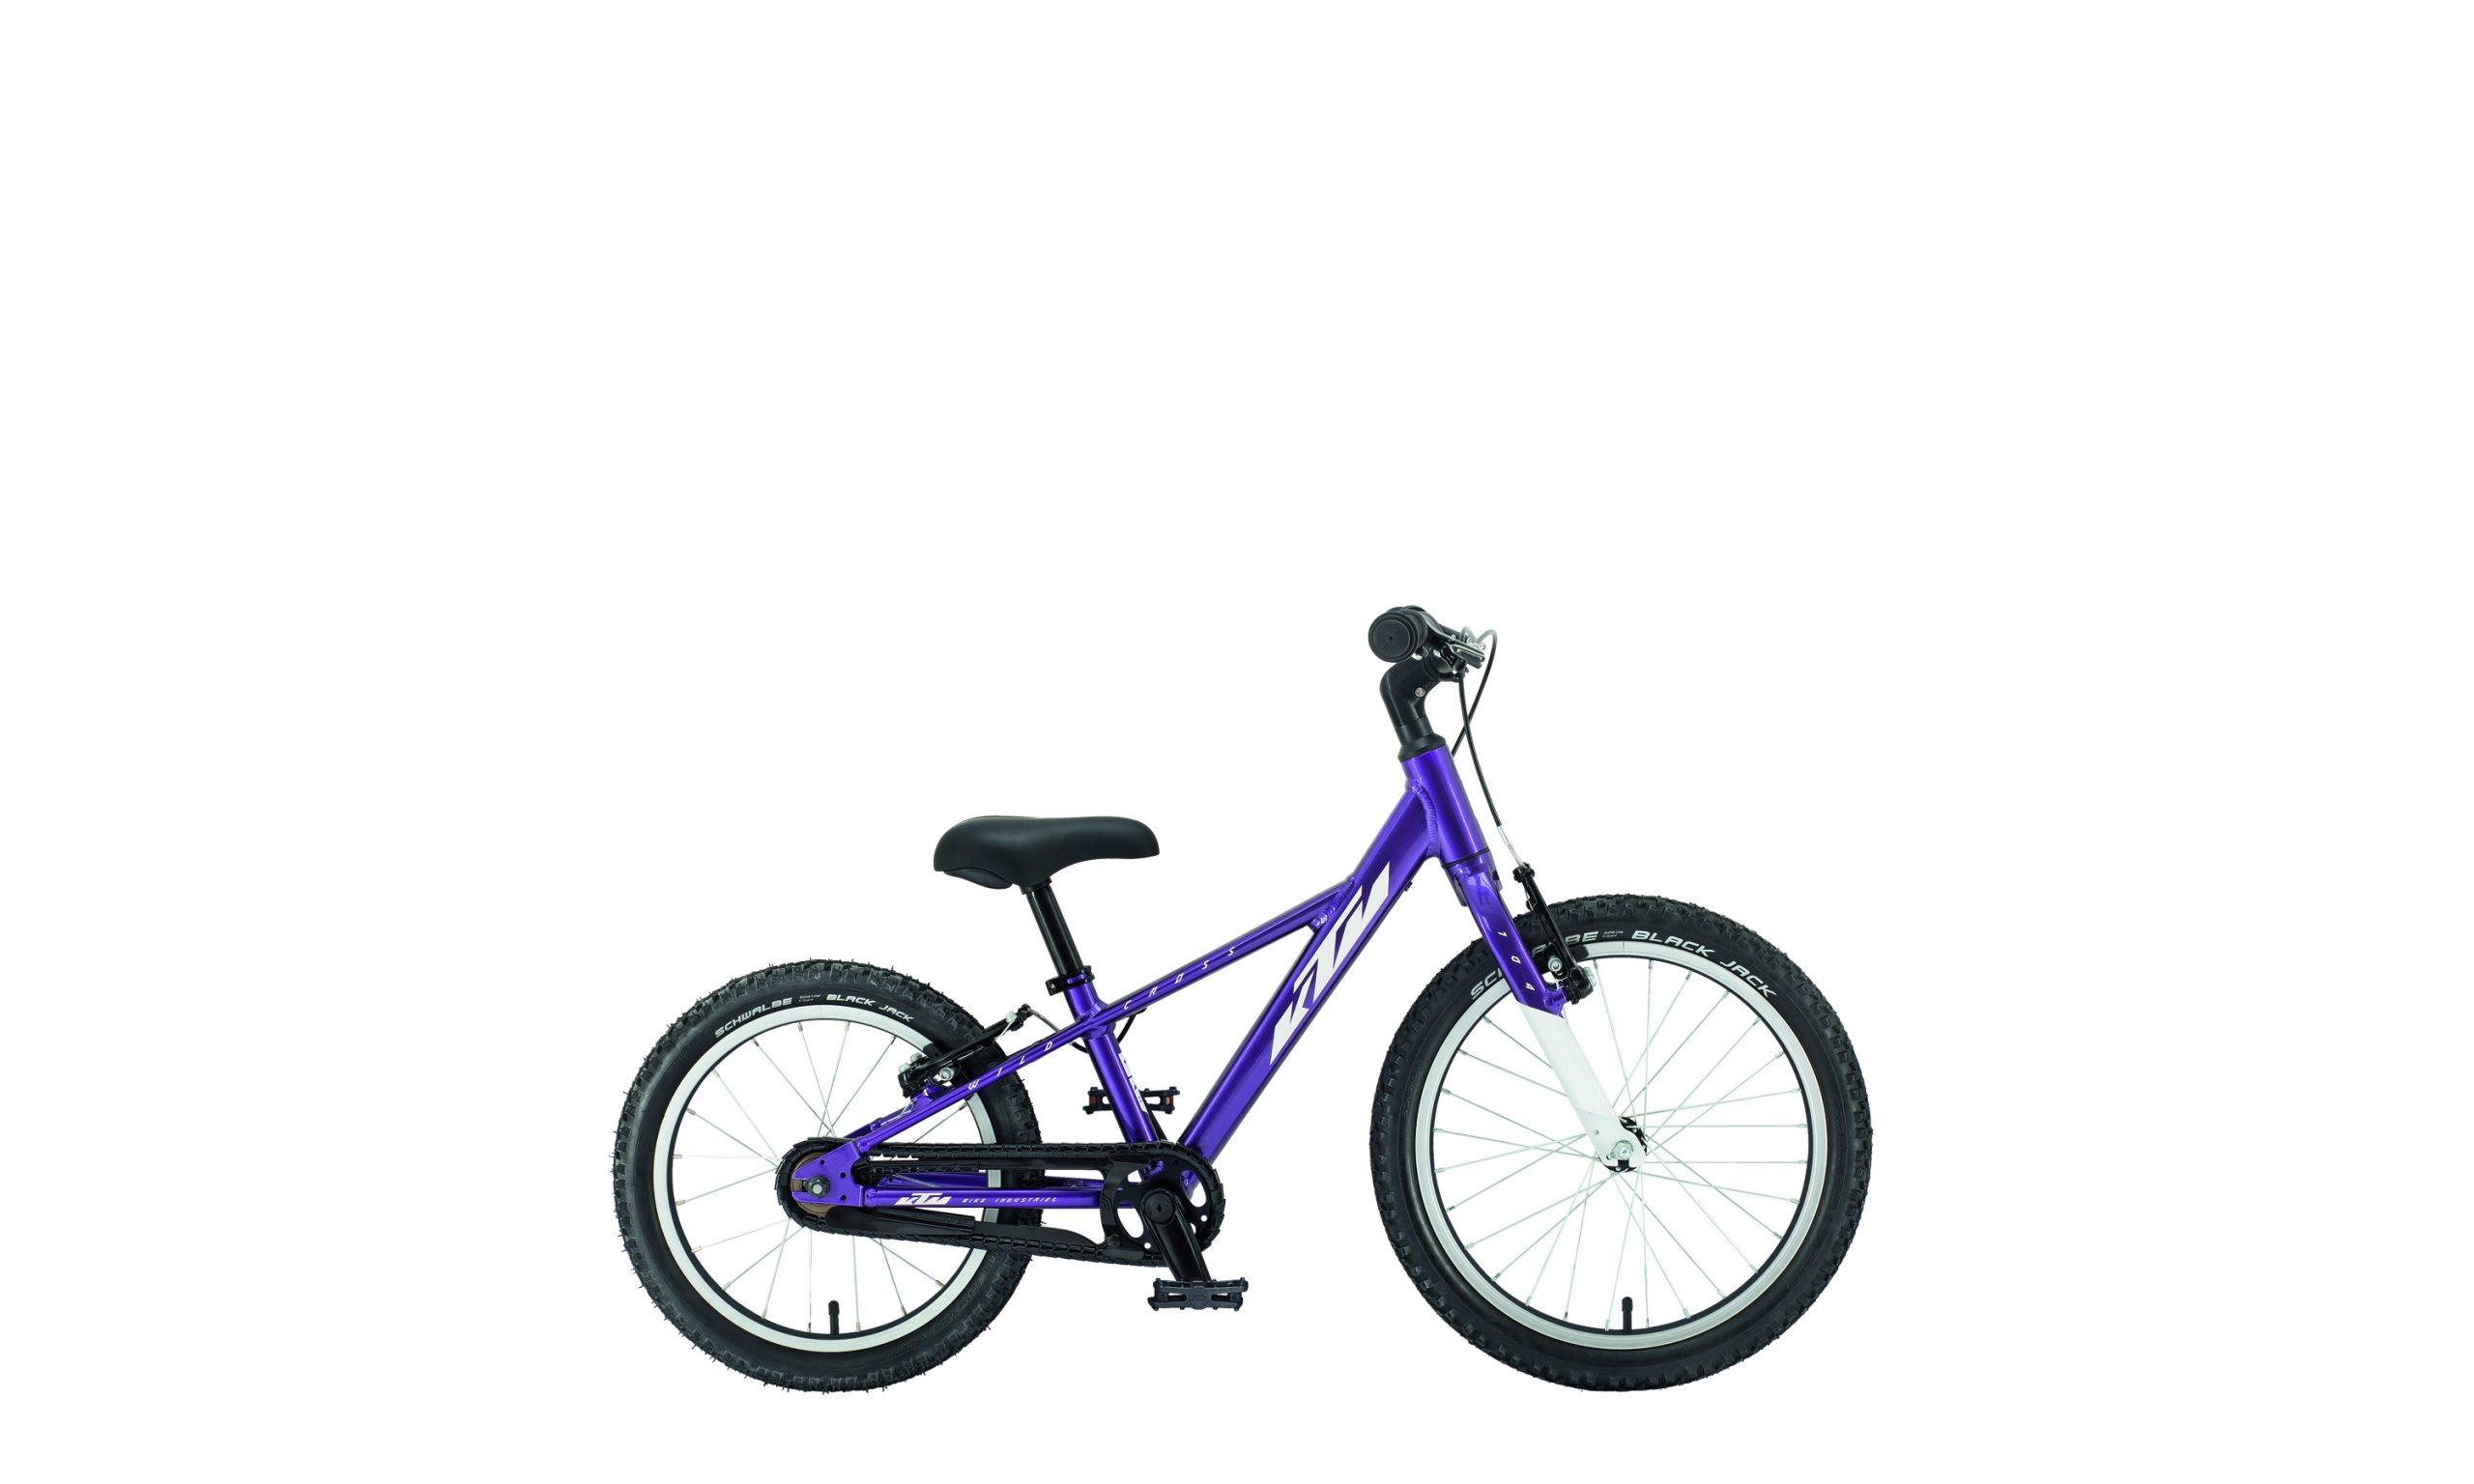 KTM Bike - WILD CROSS 16 (purple)